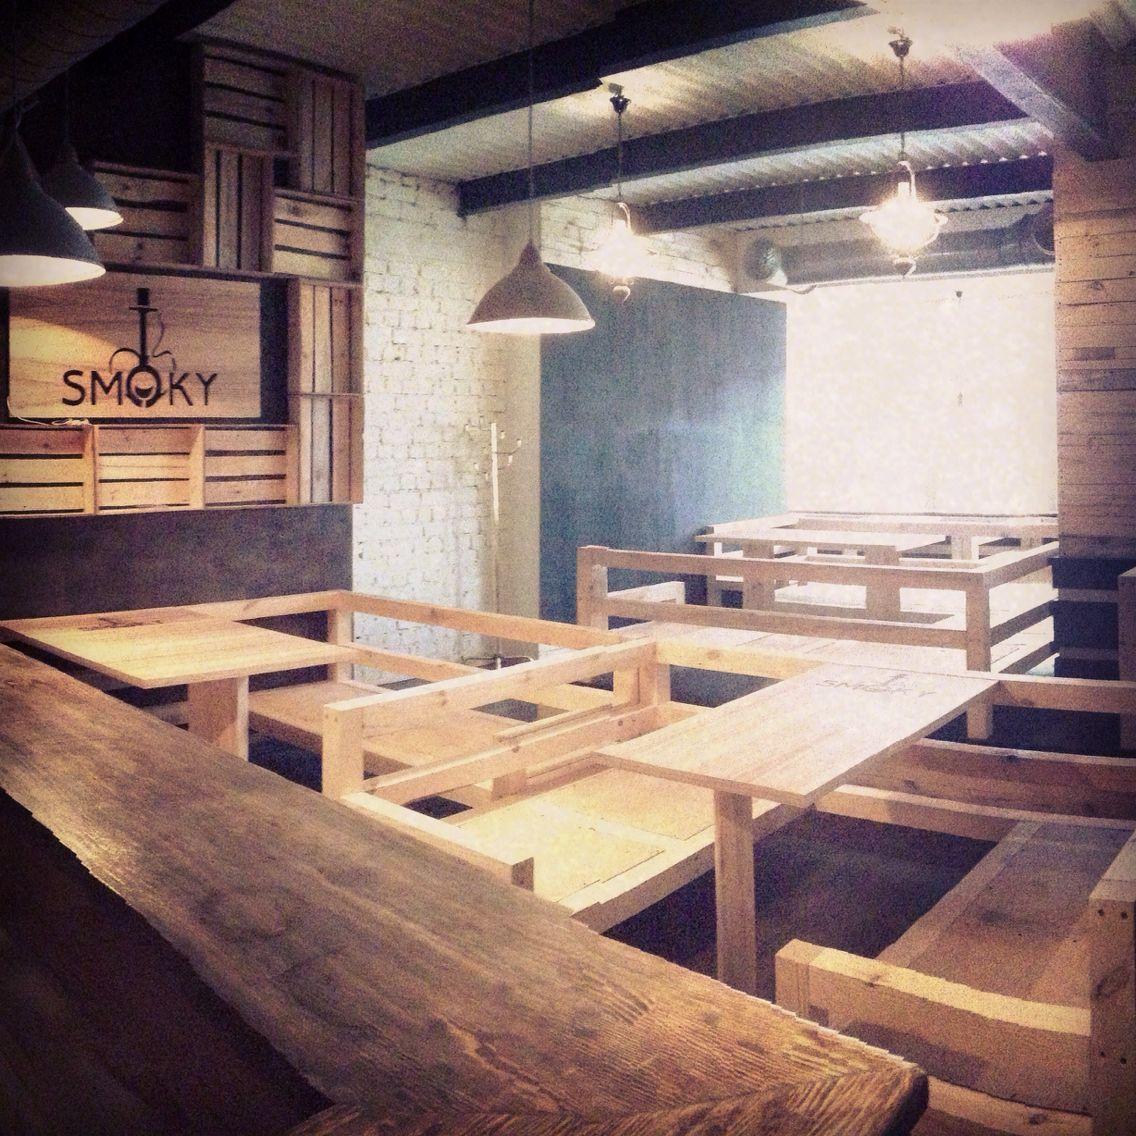 Smoky Hookah Bar.